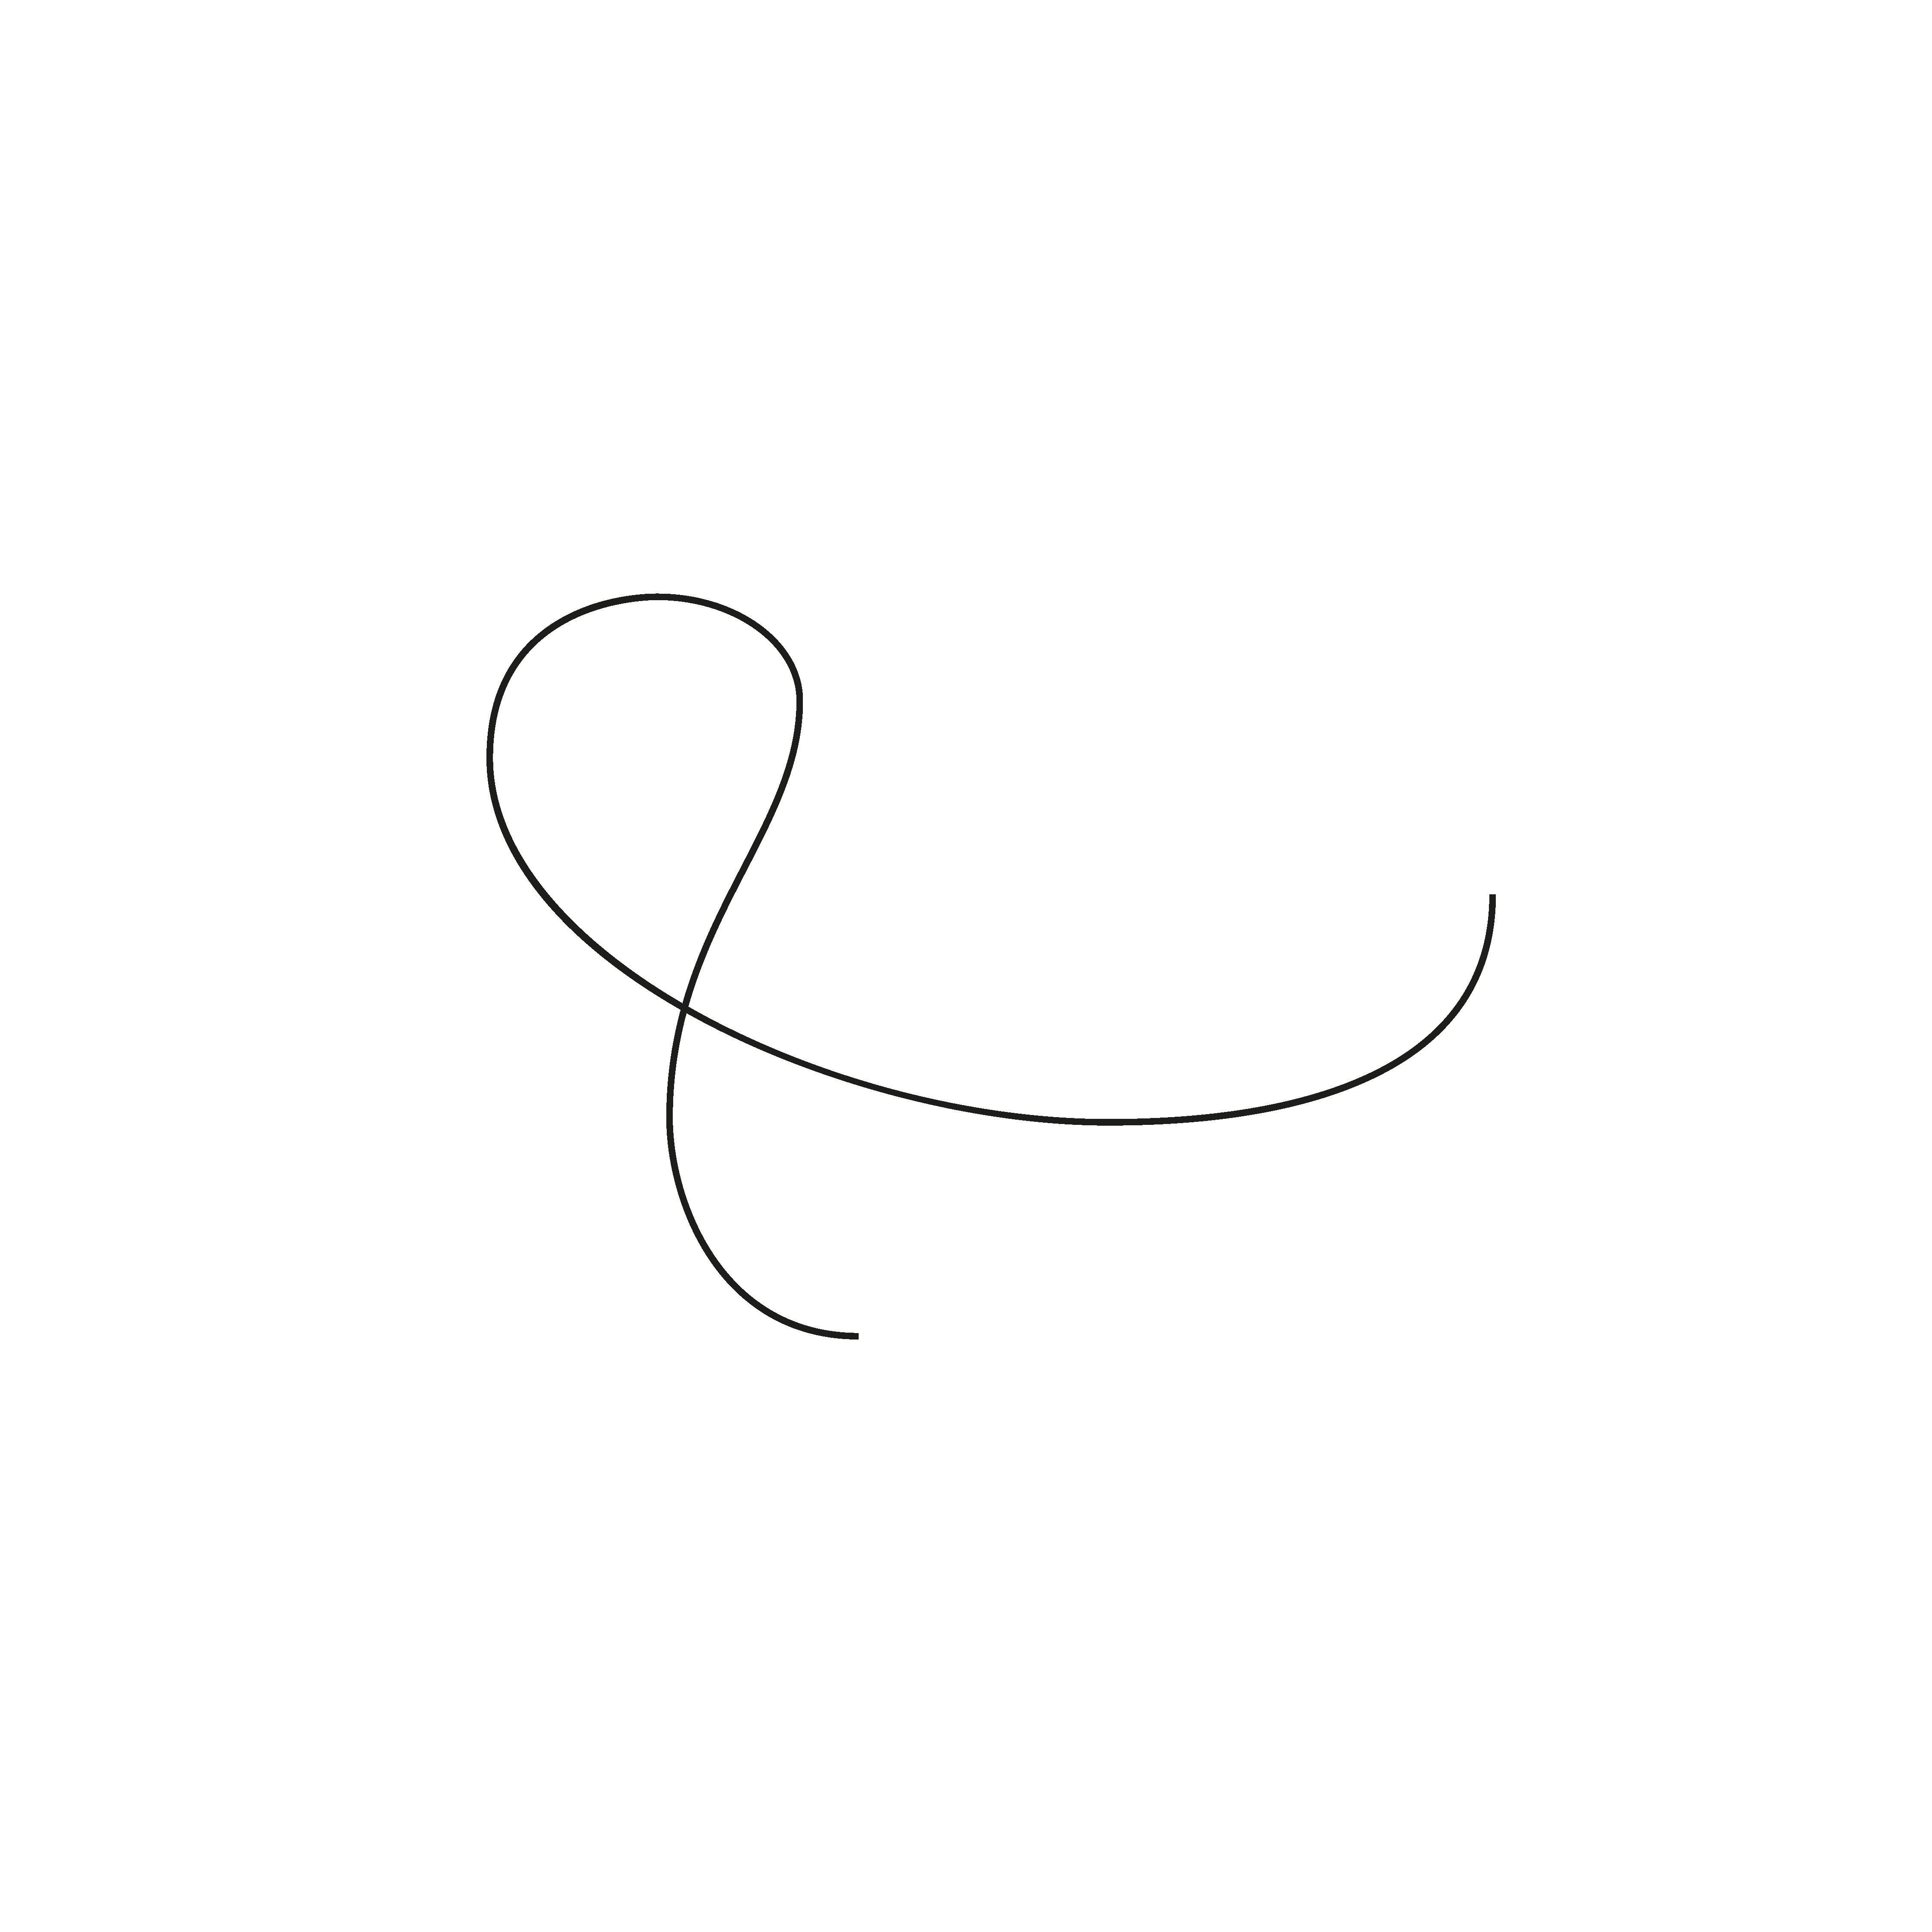 No. 27 – ring wind - sketch